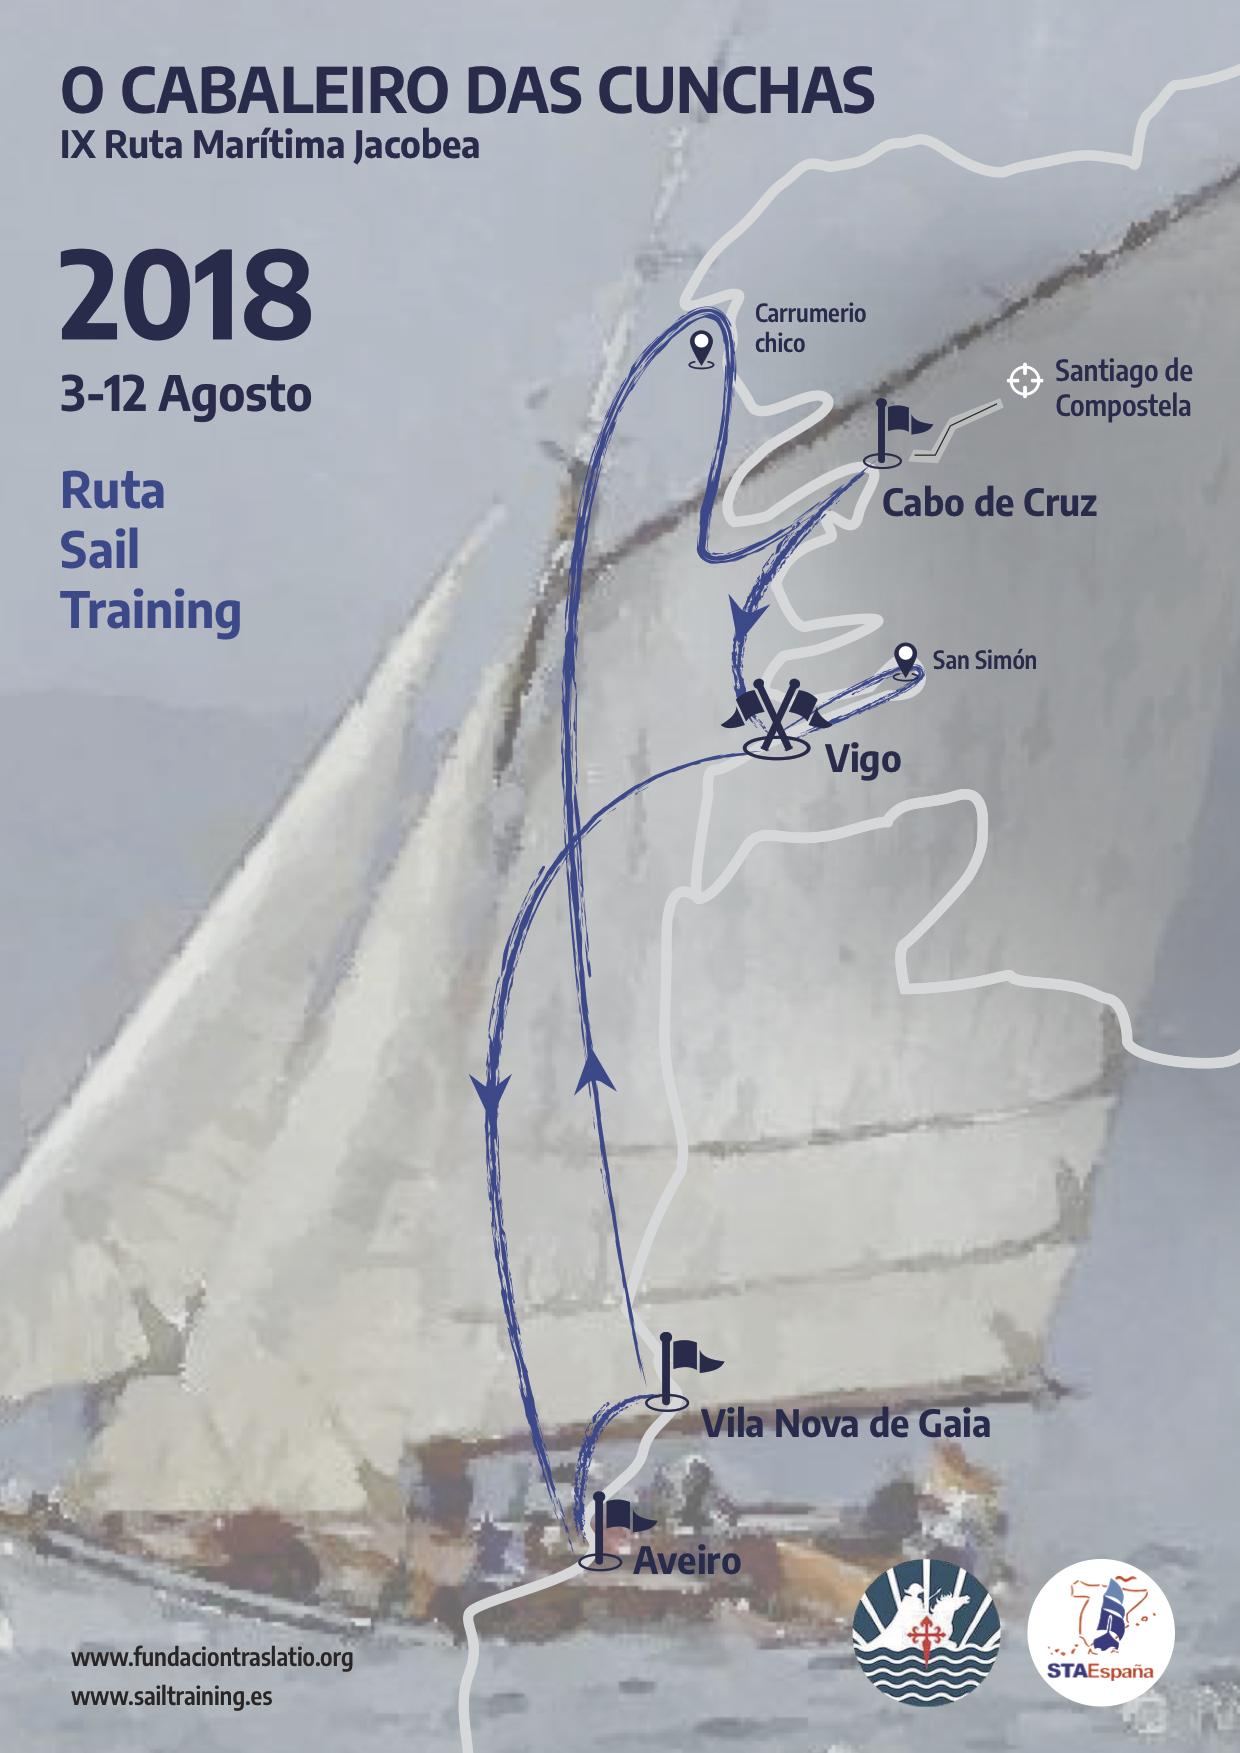 RUTA DO CABALEIRO - cartel_2018_sail training.jpg